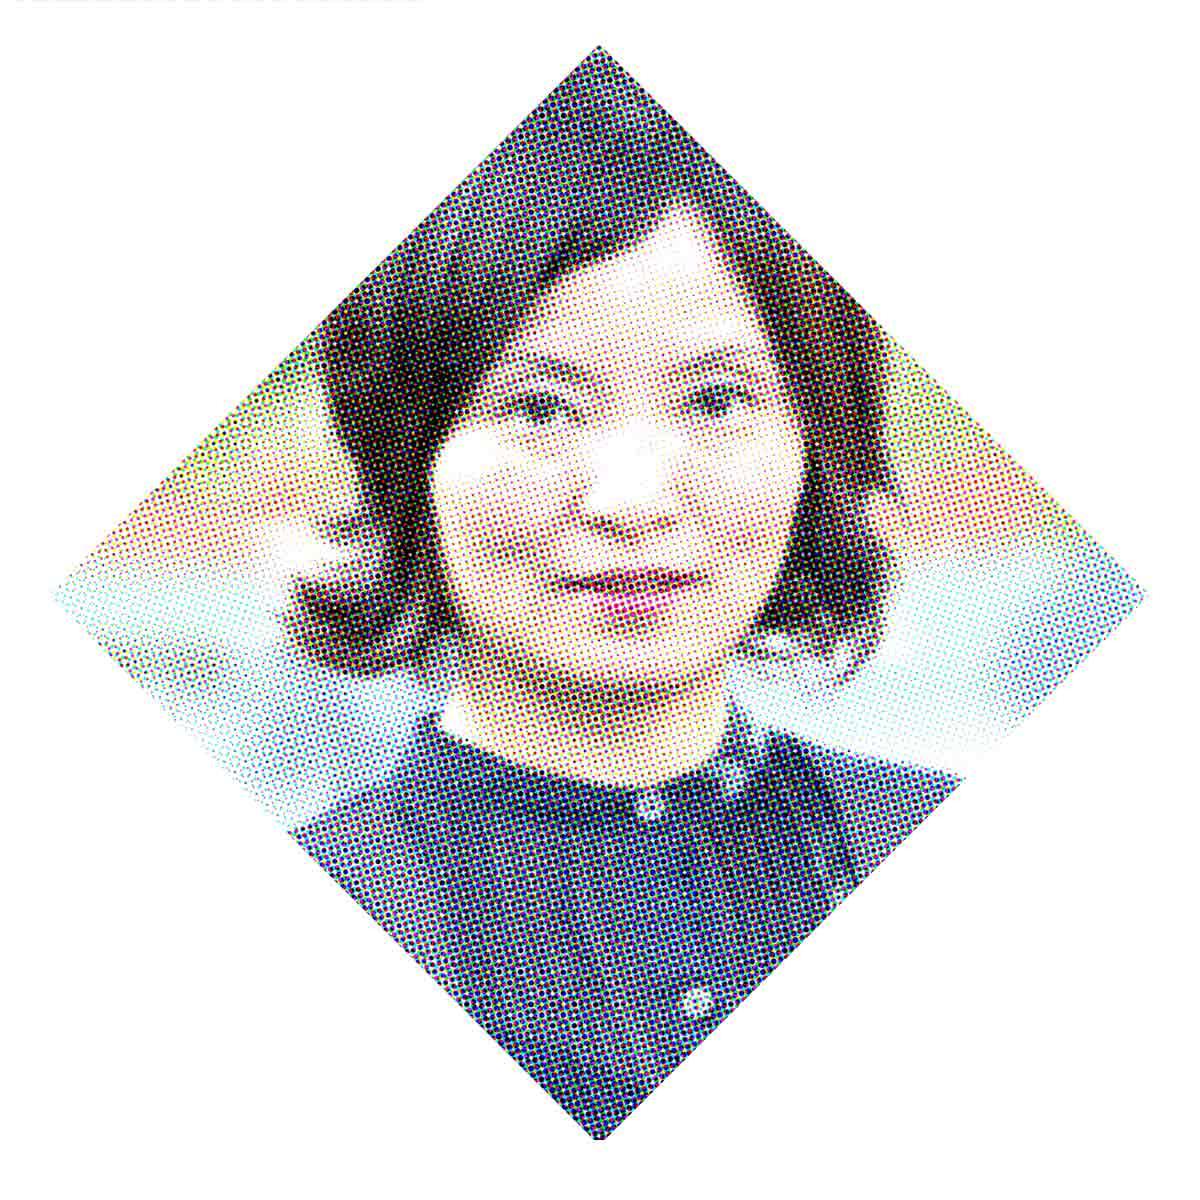 Holly Casaletto - Software Engineer - MimbleWimble Coin